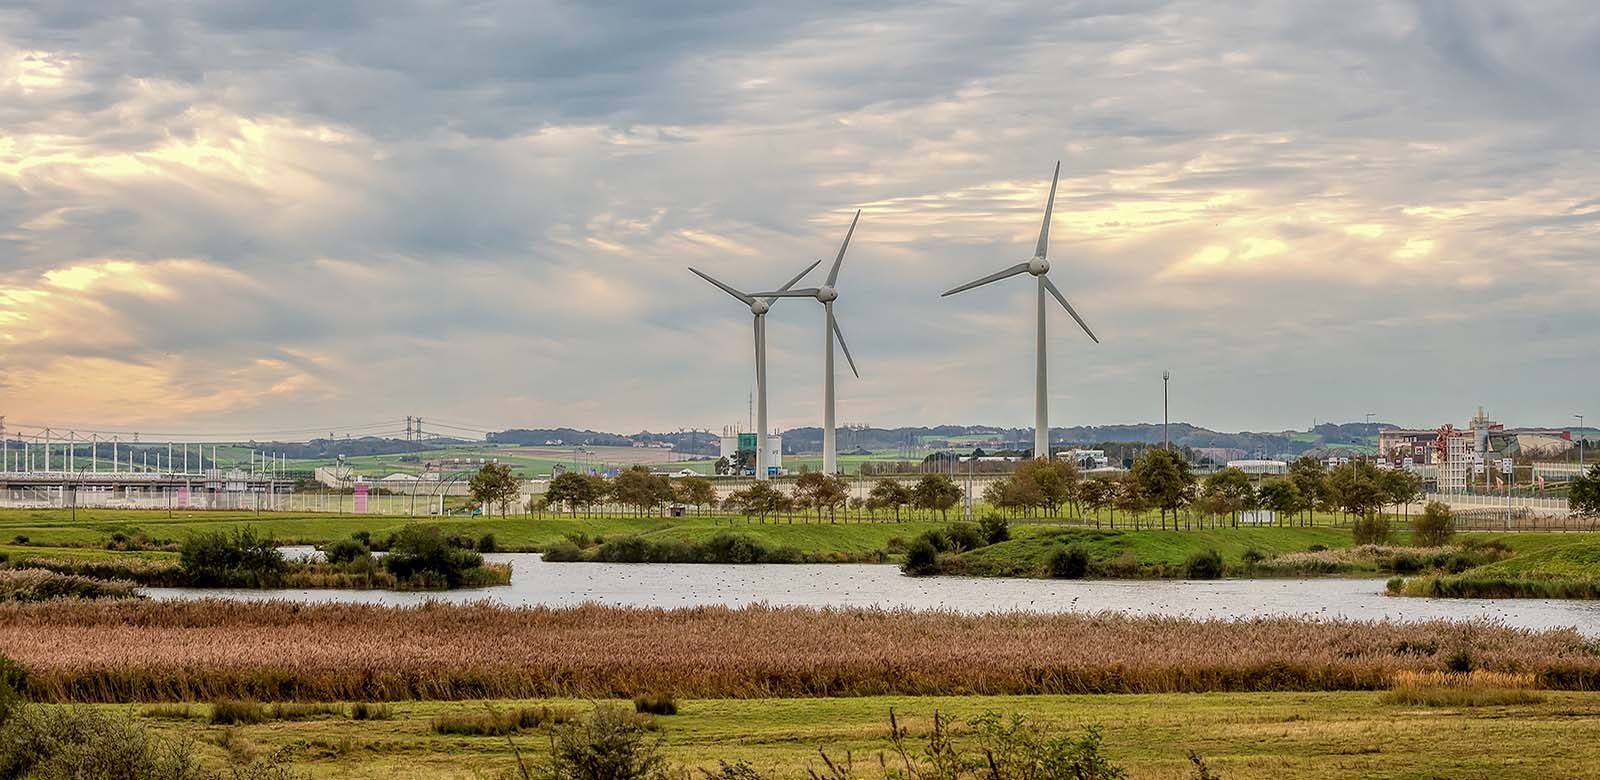 Getlink - Environmental responsibility